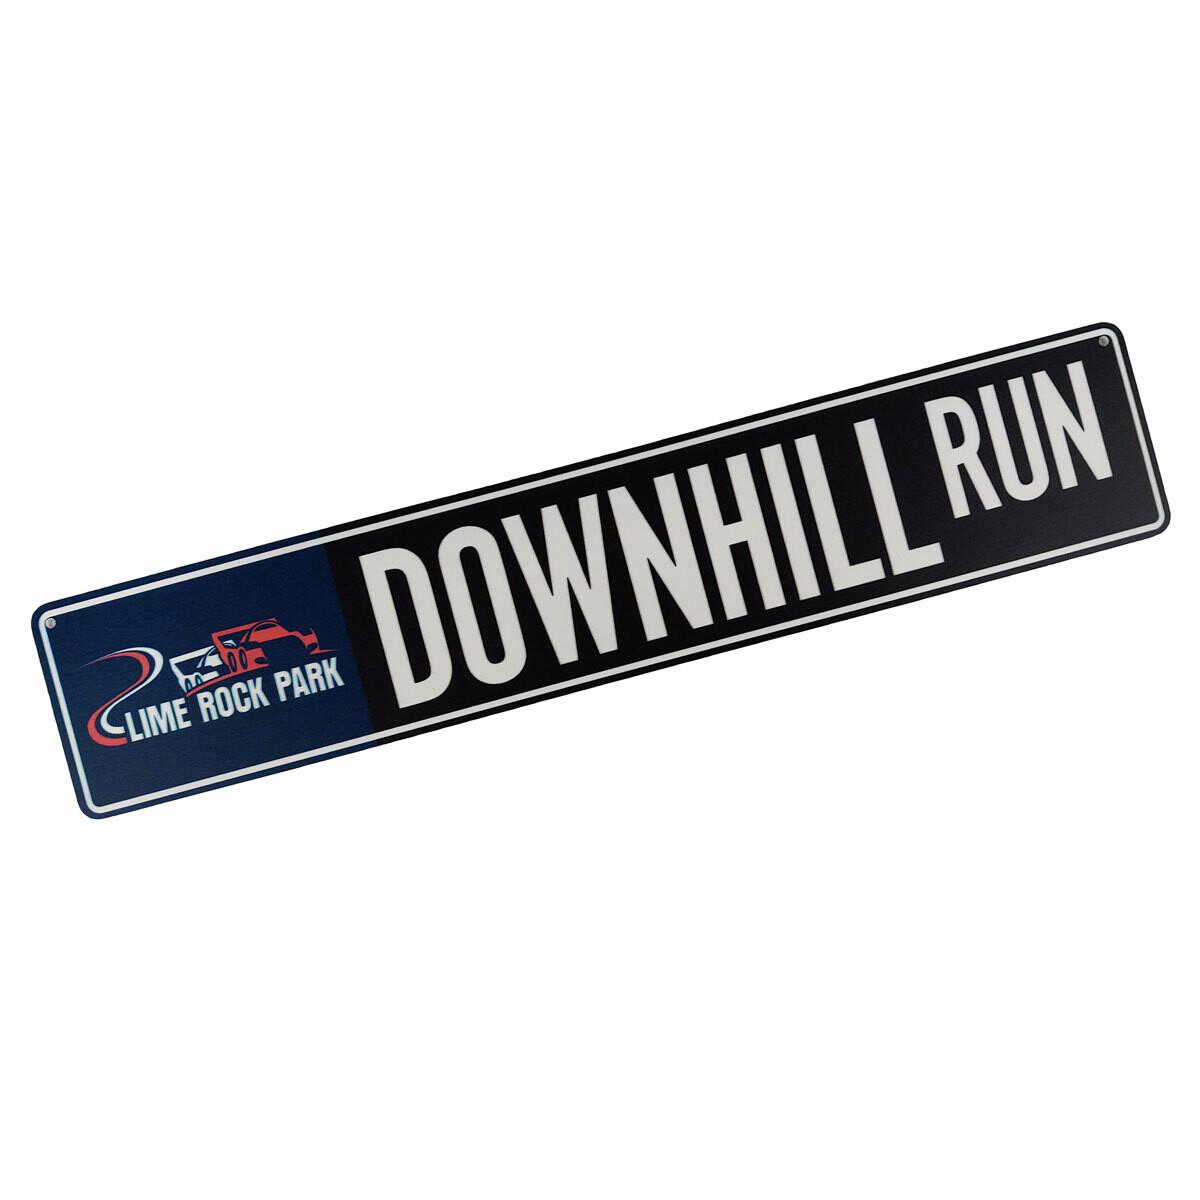 Street Sign - Downhill Run